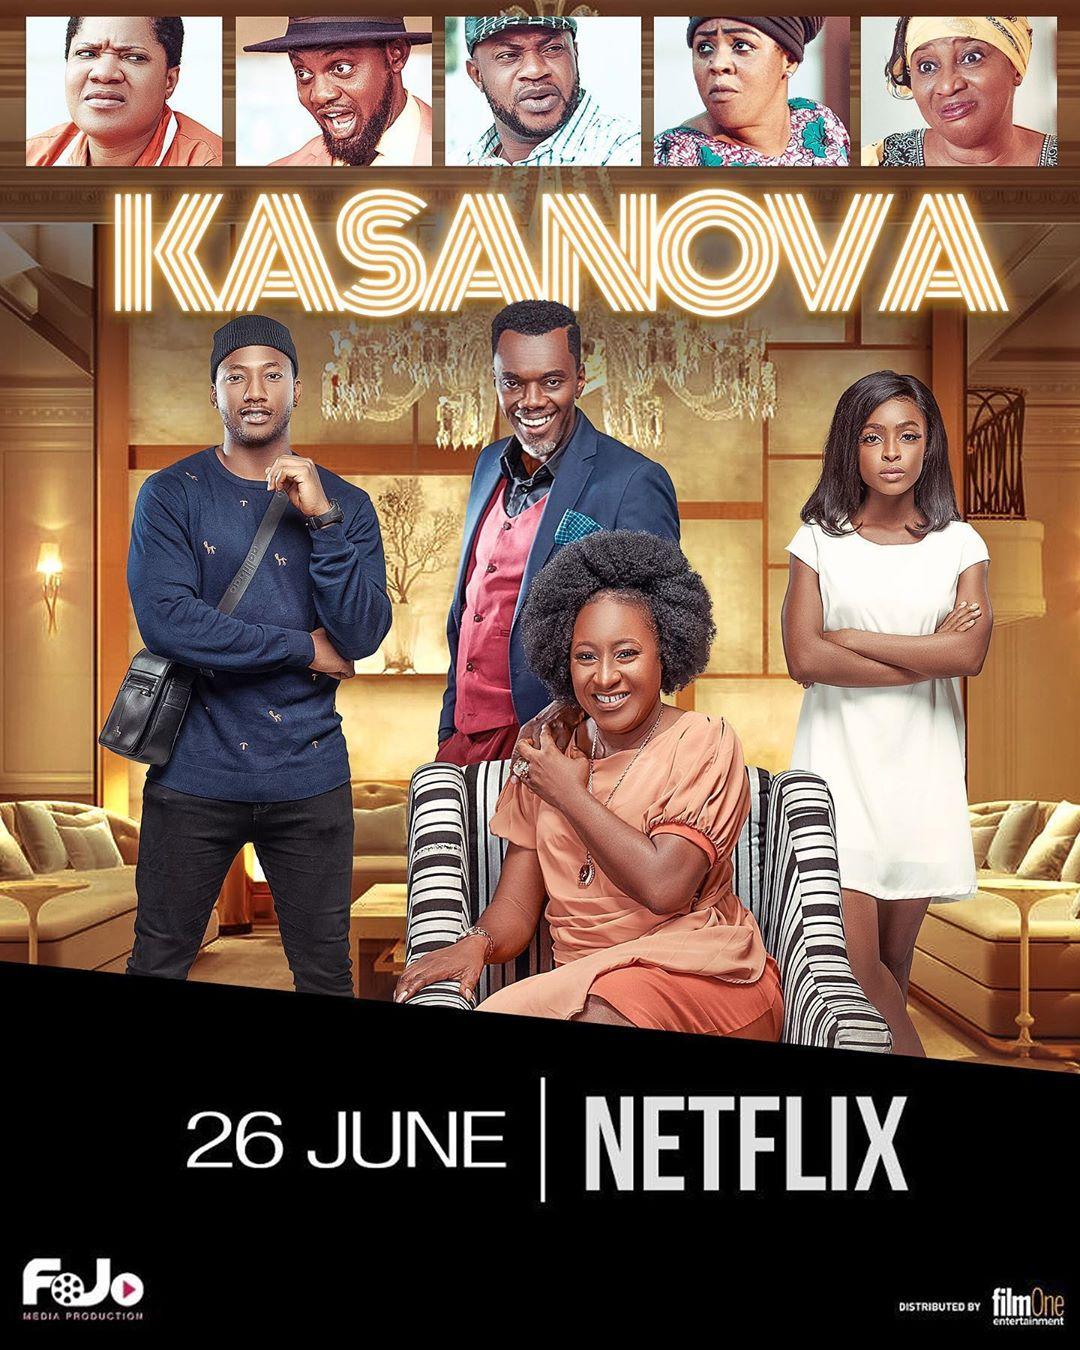 Kasanova Hits Netflix